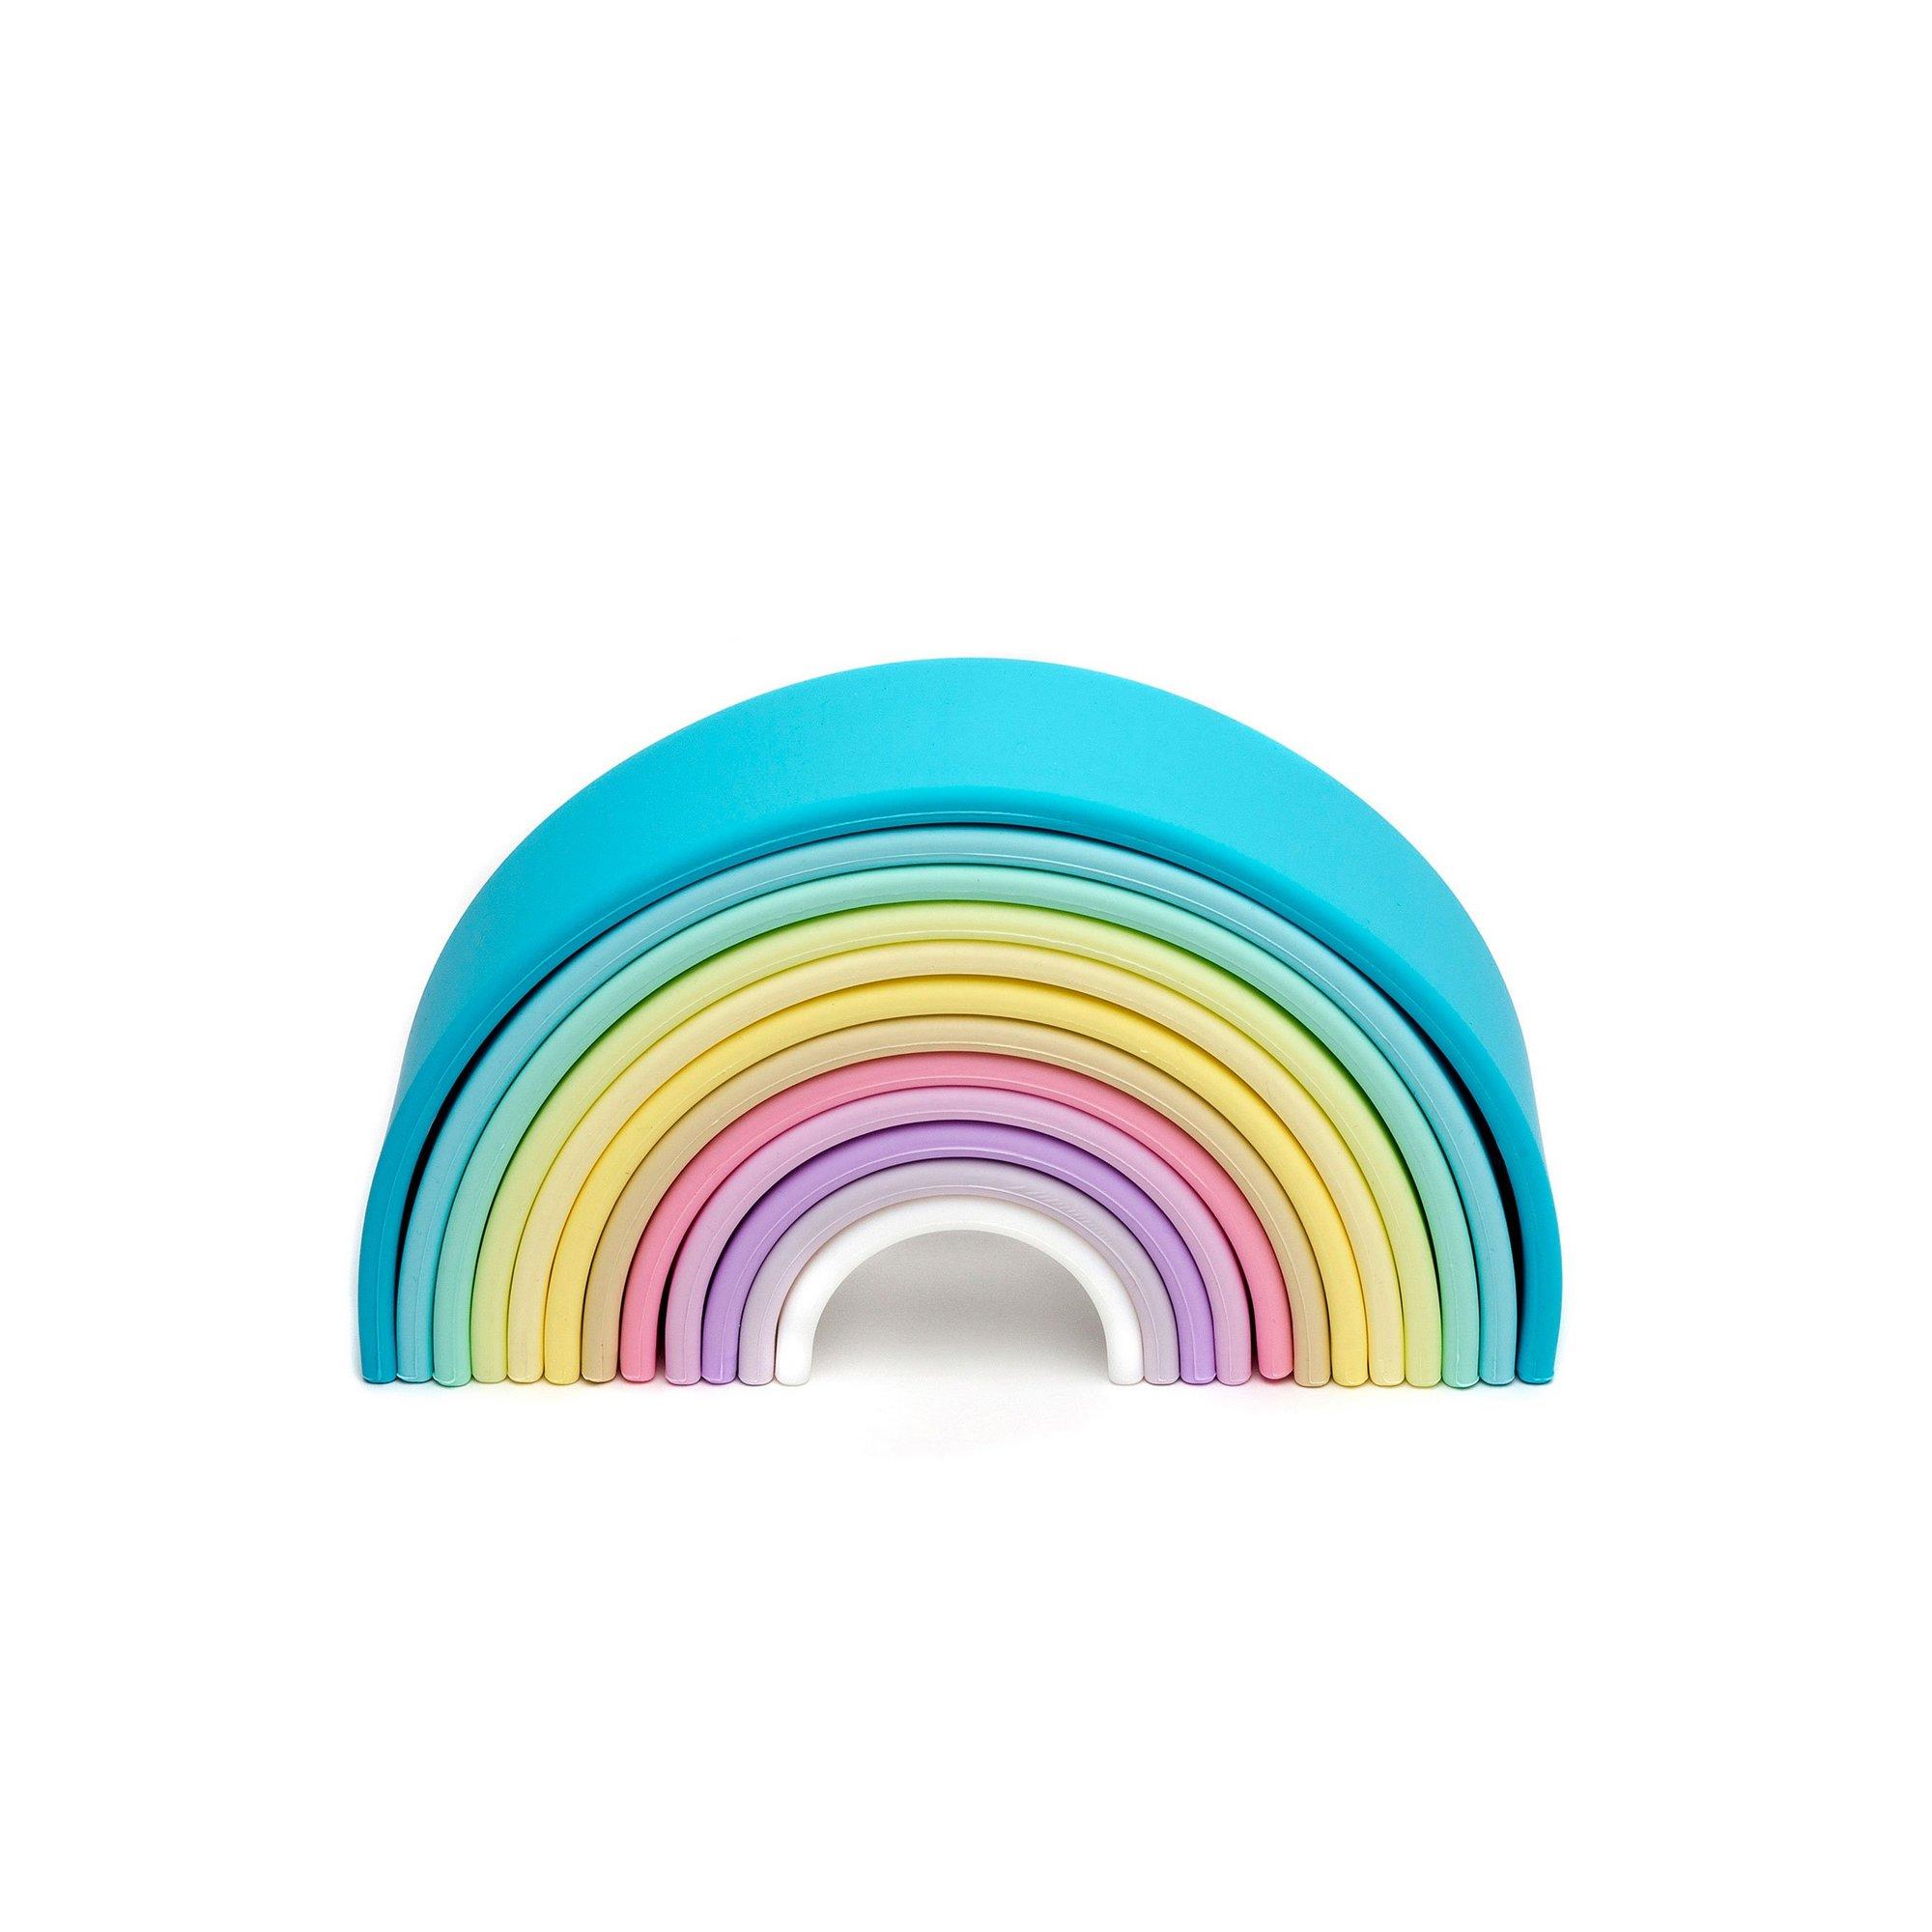 Image of Dena 12 Piece Silicone Rainbow Toy - Pastel